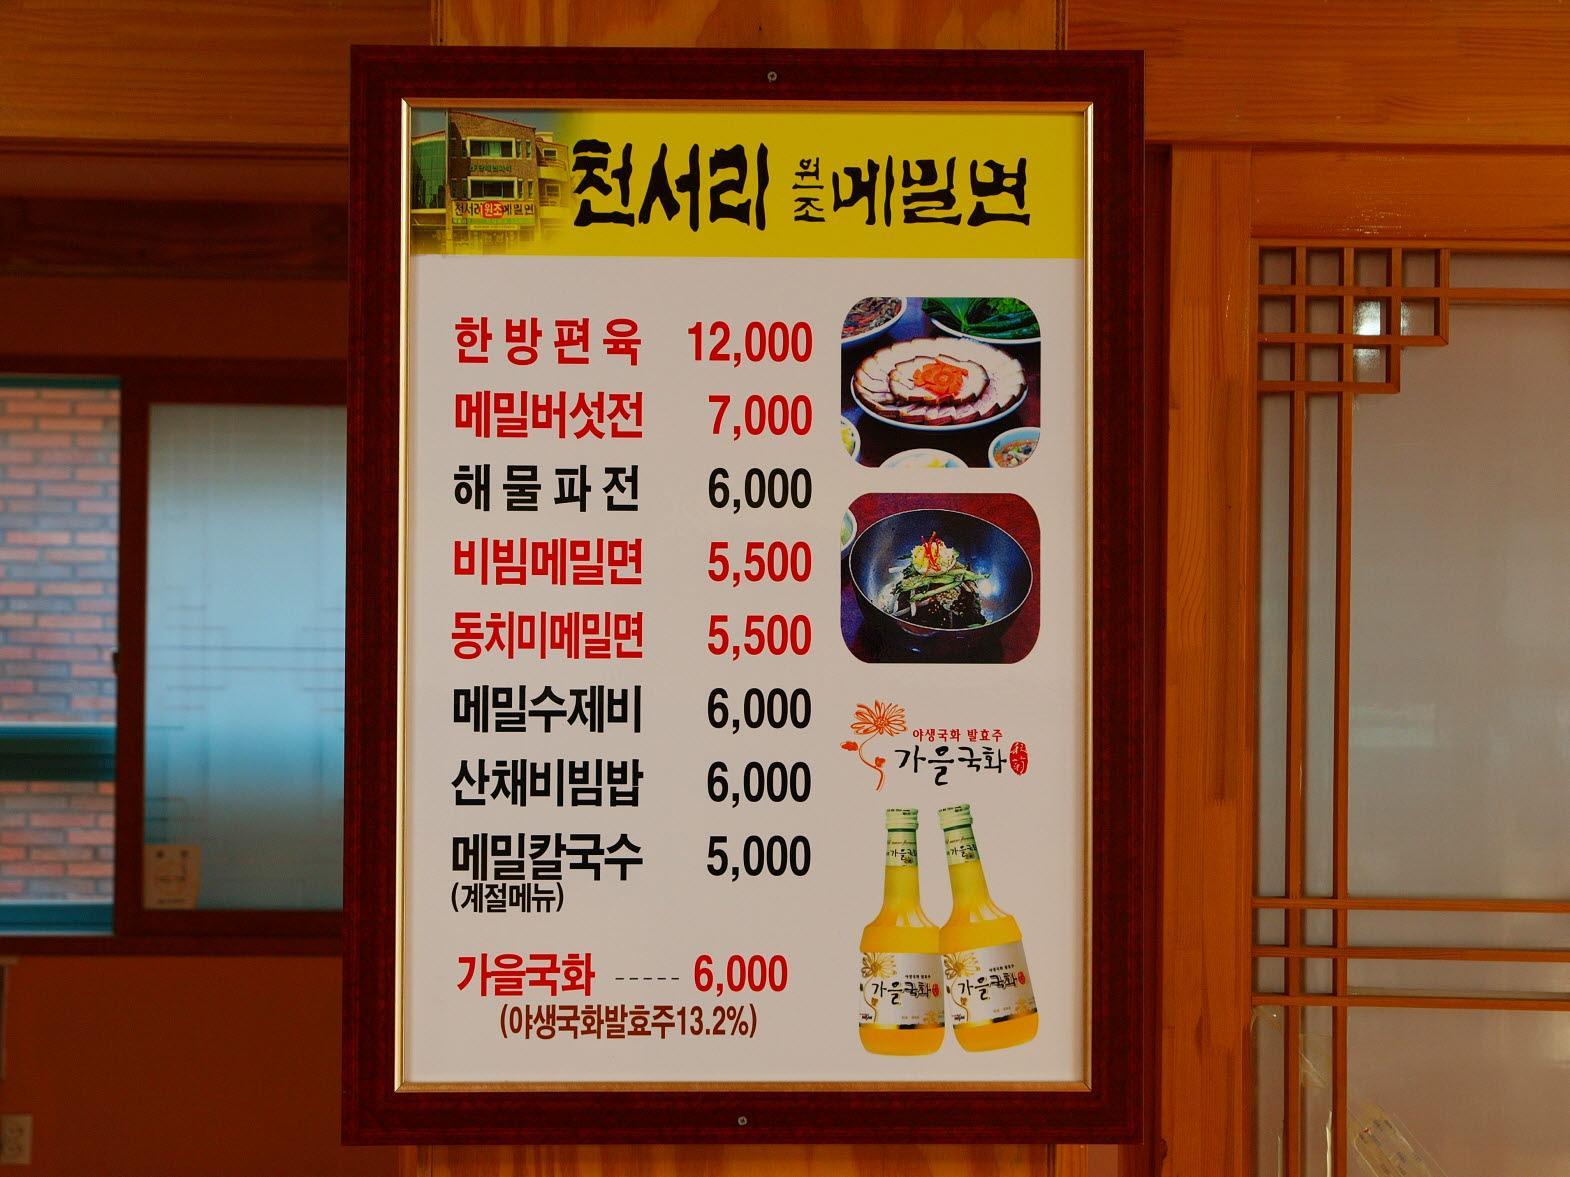 Cheonseoli Original Buckwheat Noodles Restaurant